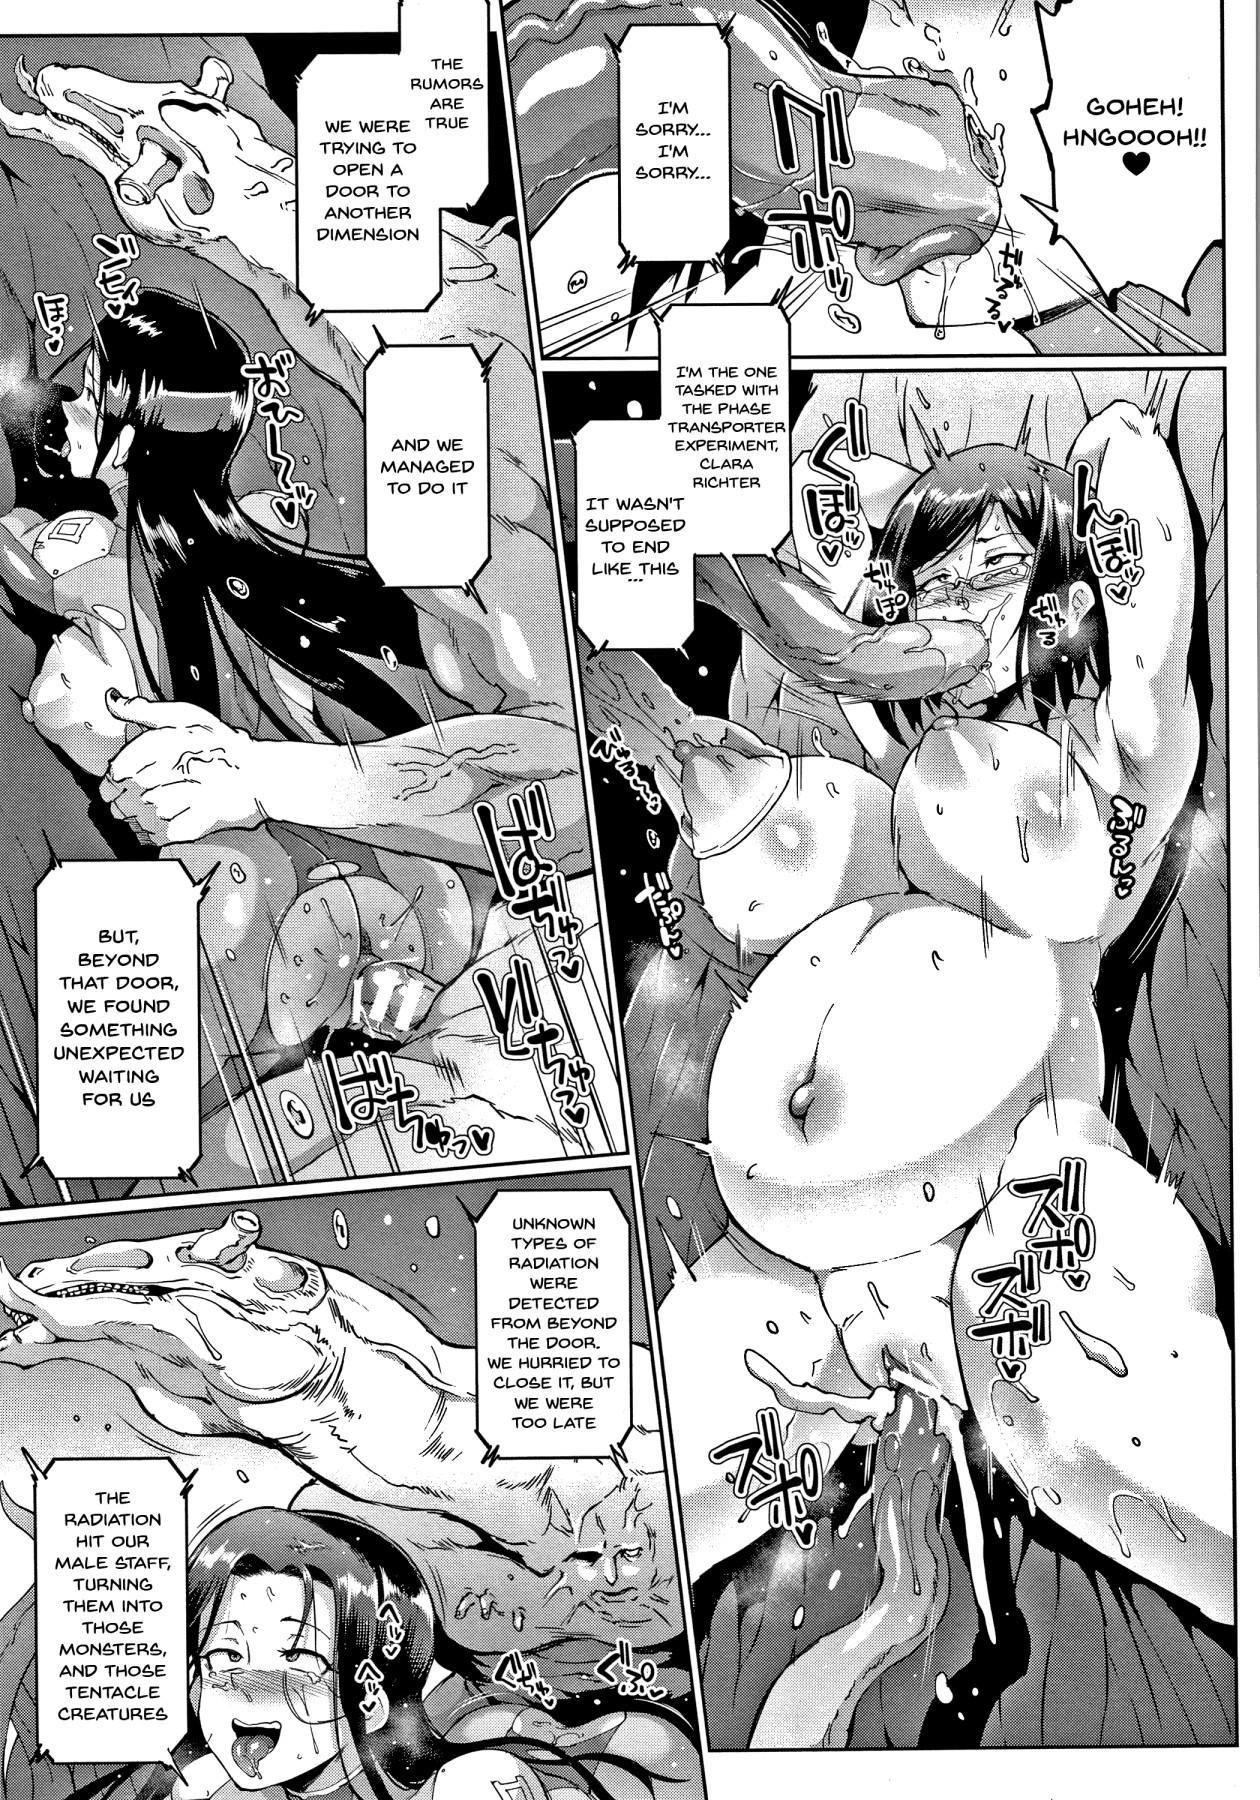 [Fan no Hitori] Sennen Reijou ~My Lady, My Master~  Ch.1-6 [English] {Doujins.com} 141